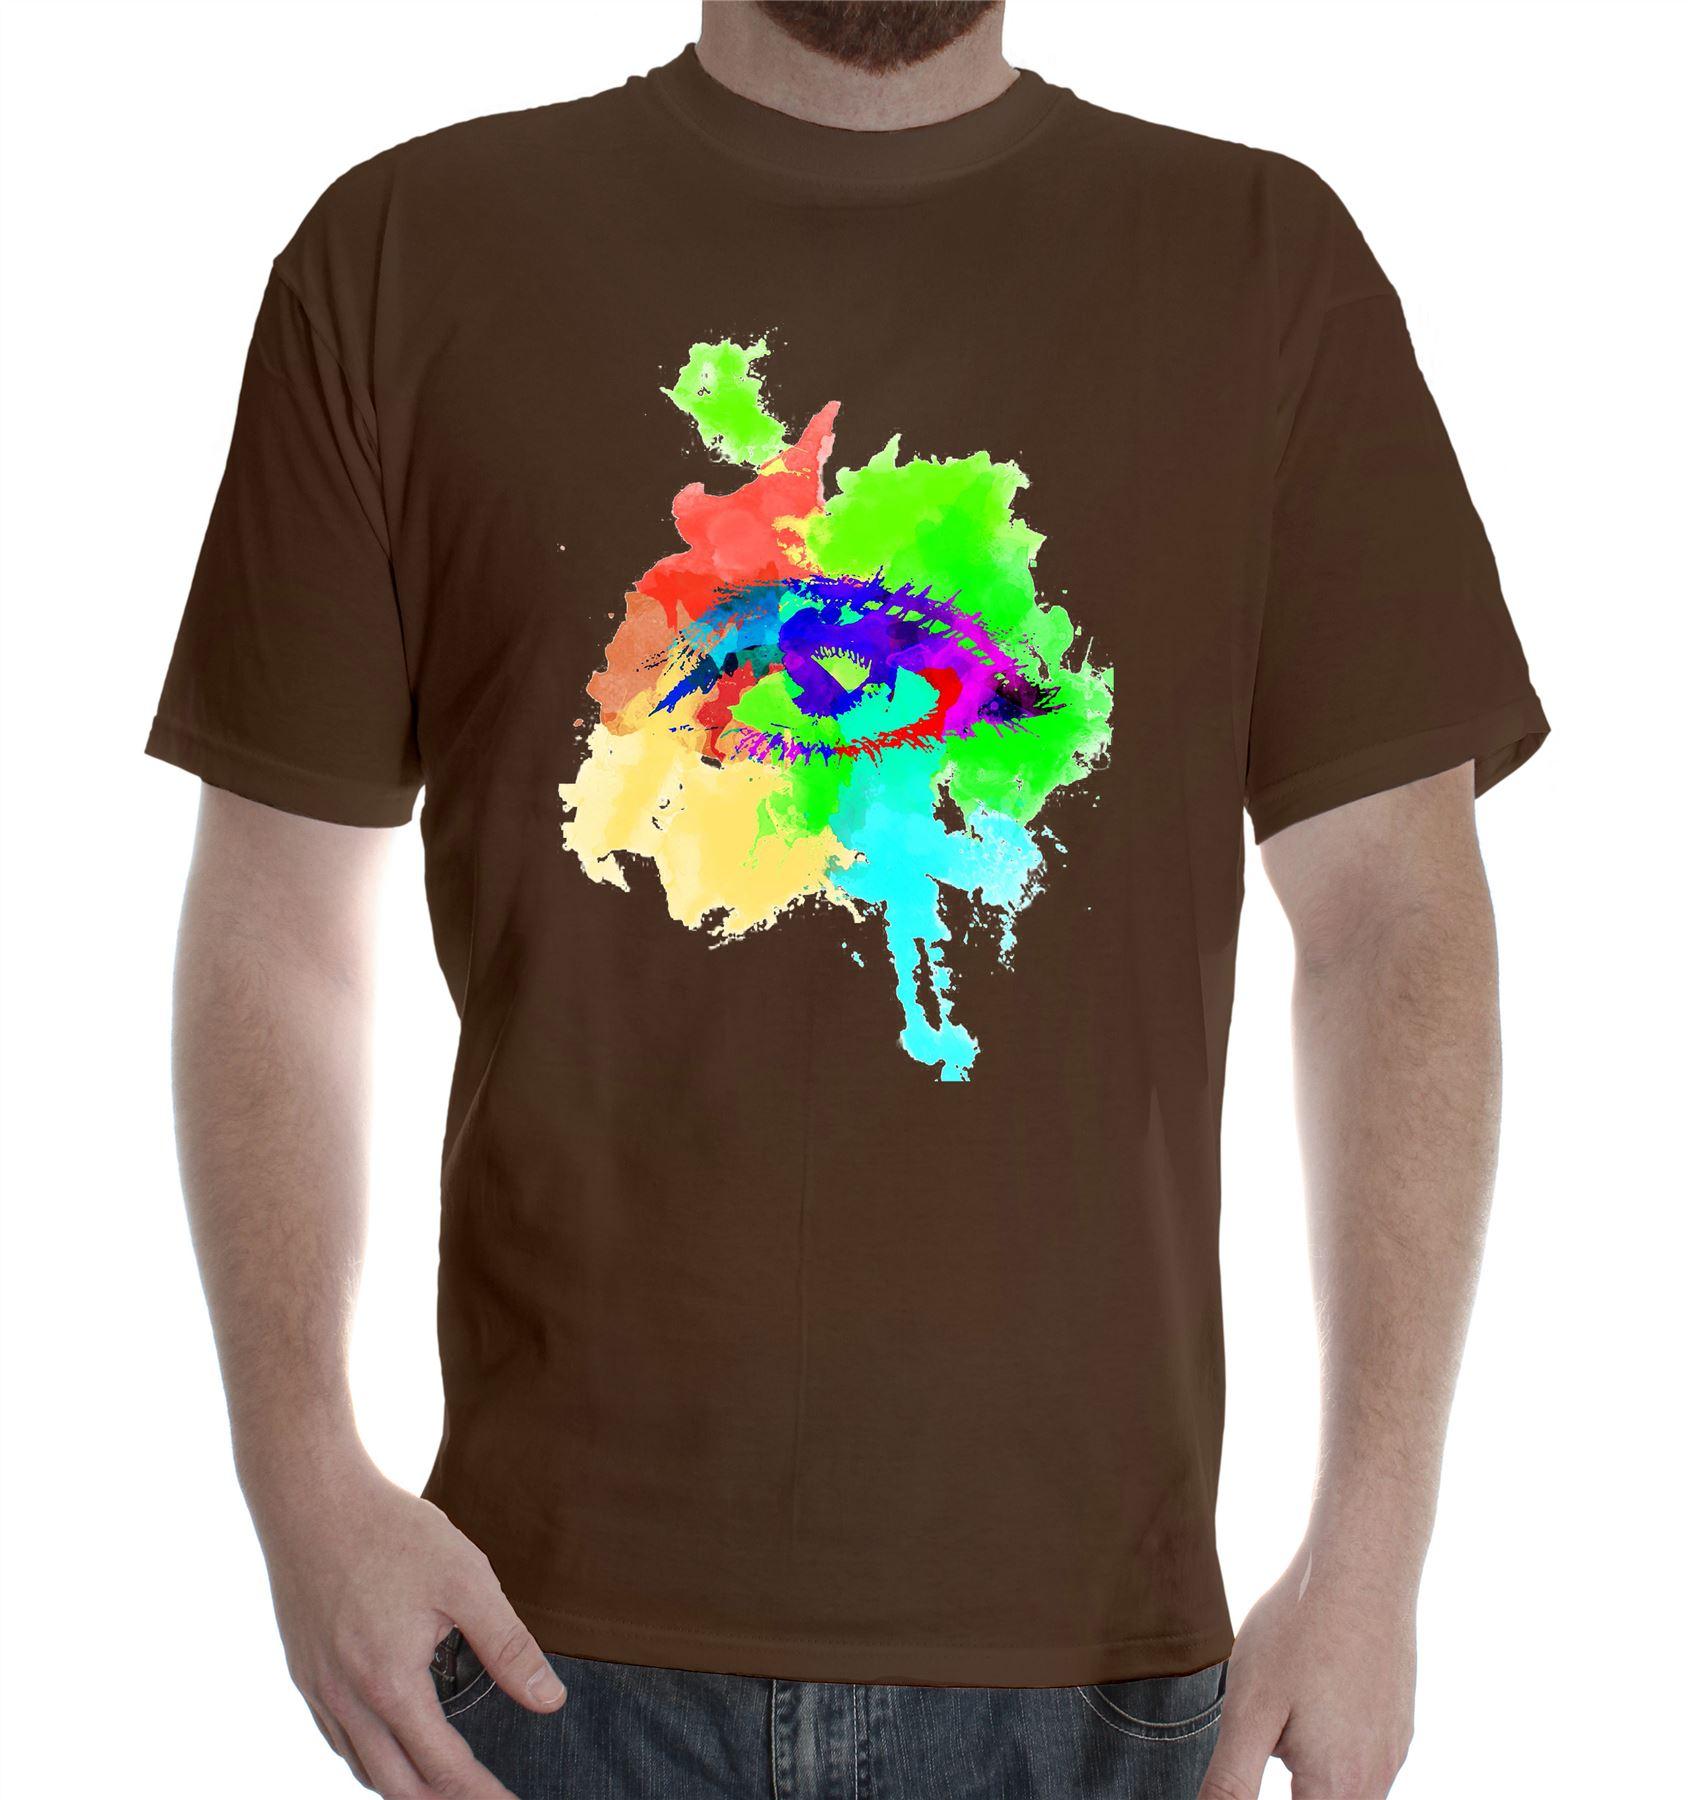 T shirt mystery hippie eye peace hobo boho providence for Hippie t shirts australia